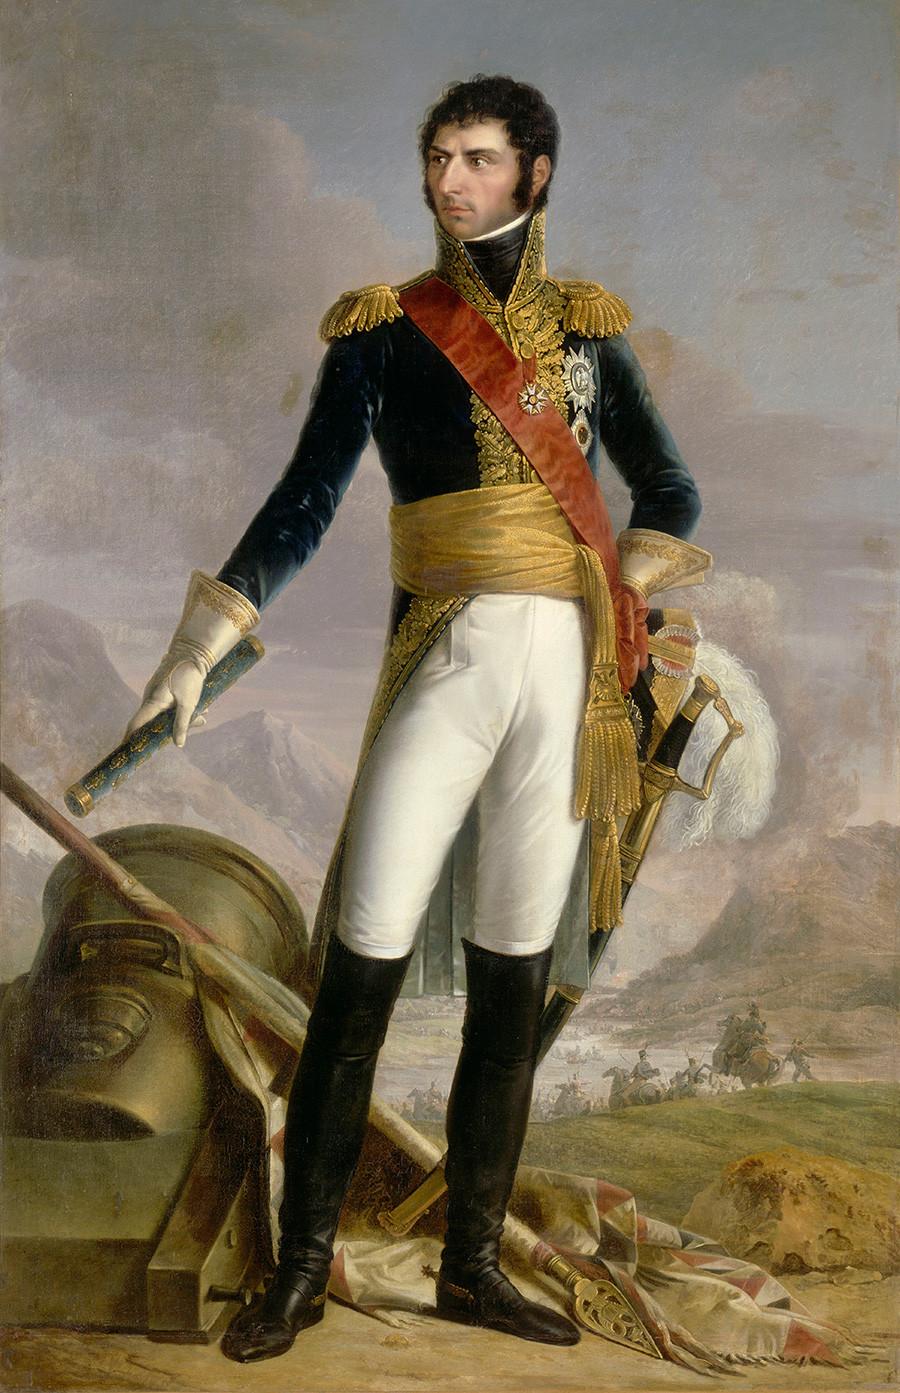 Il generale francese Jean-Baptiste Bernadotte (1763-1844)